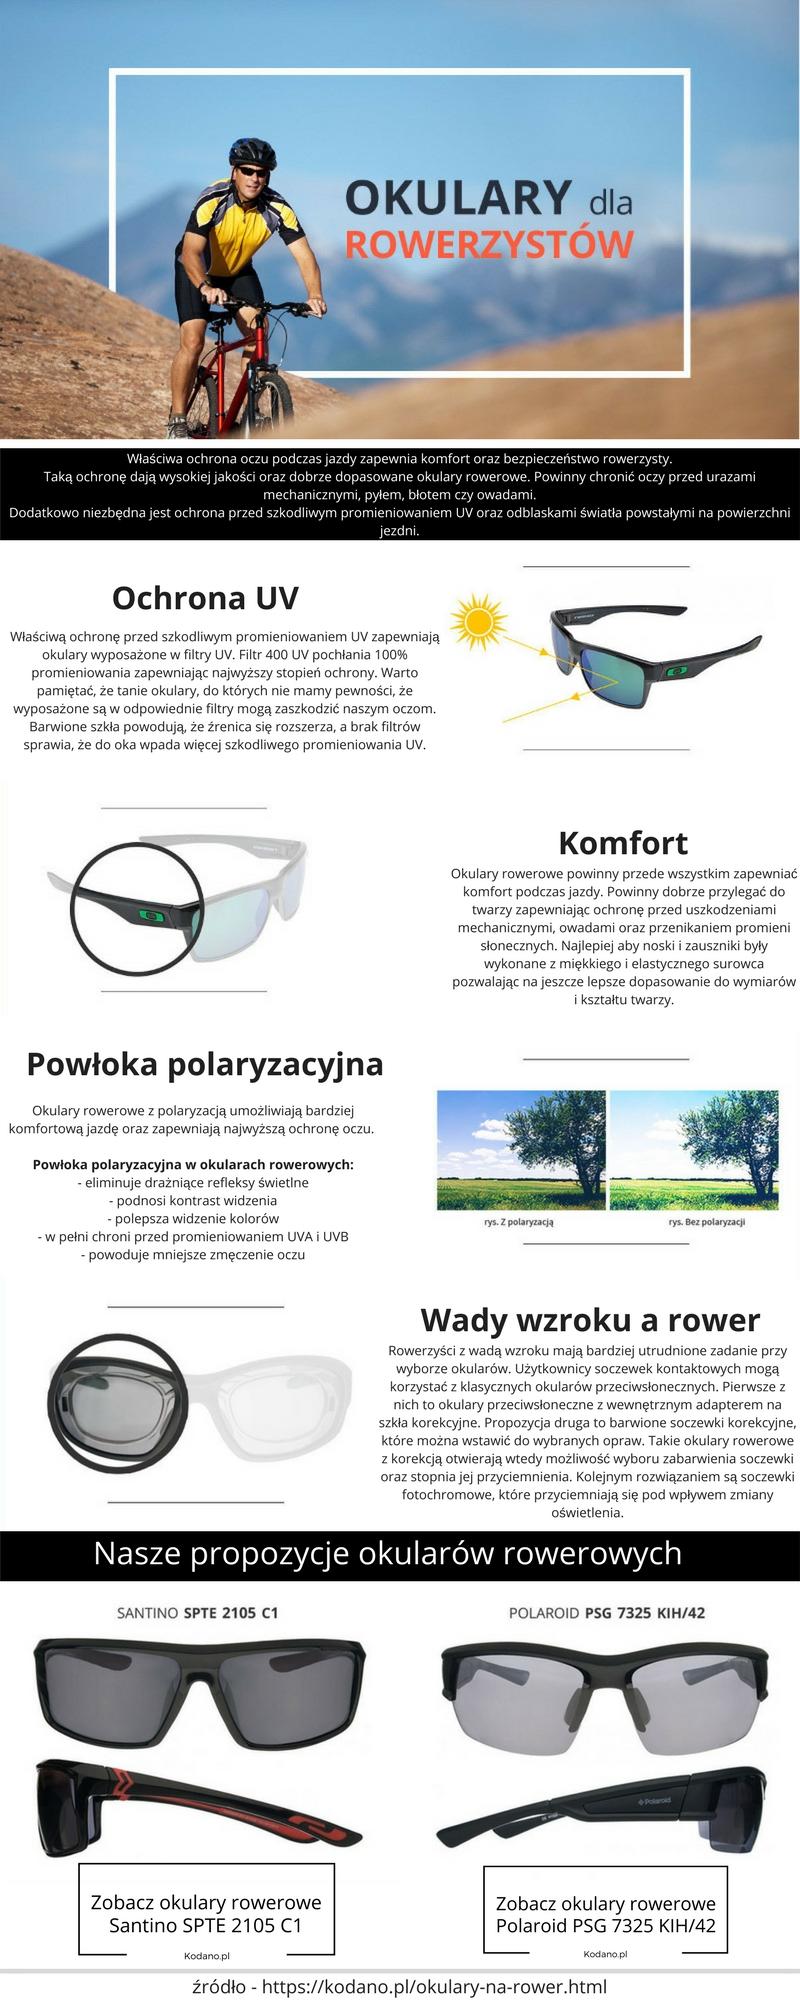 okulary rowerowe - cechy i modele